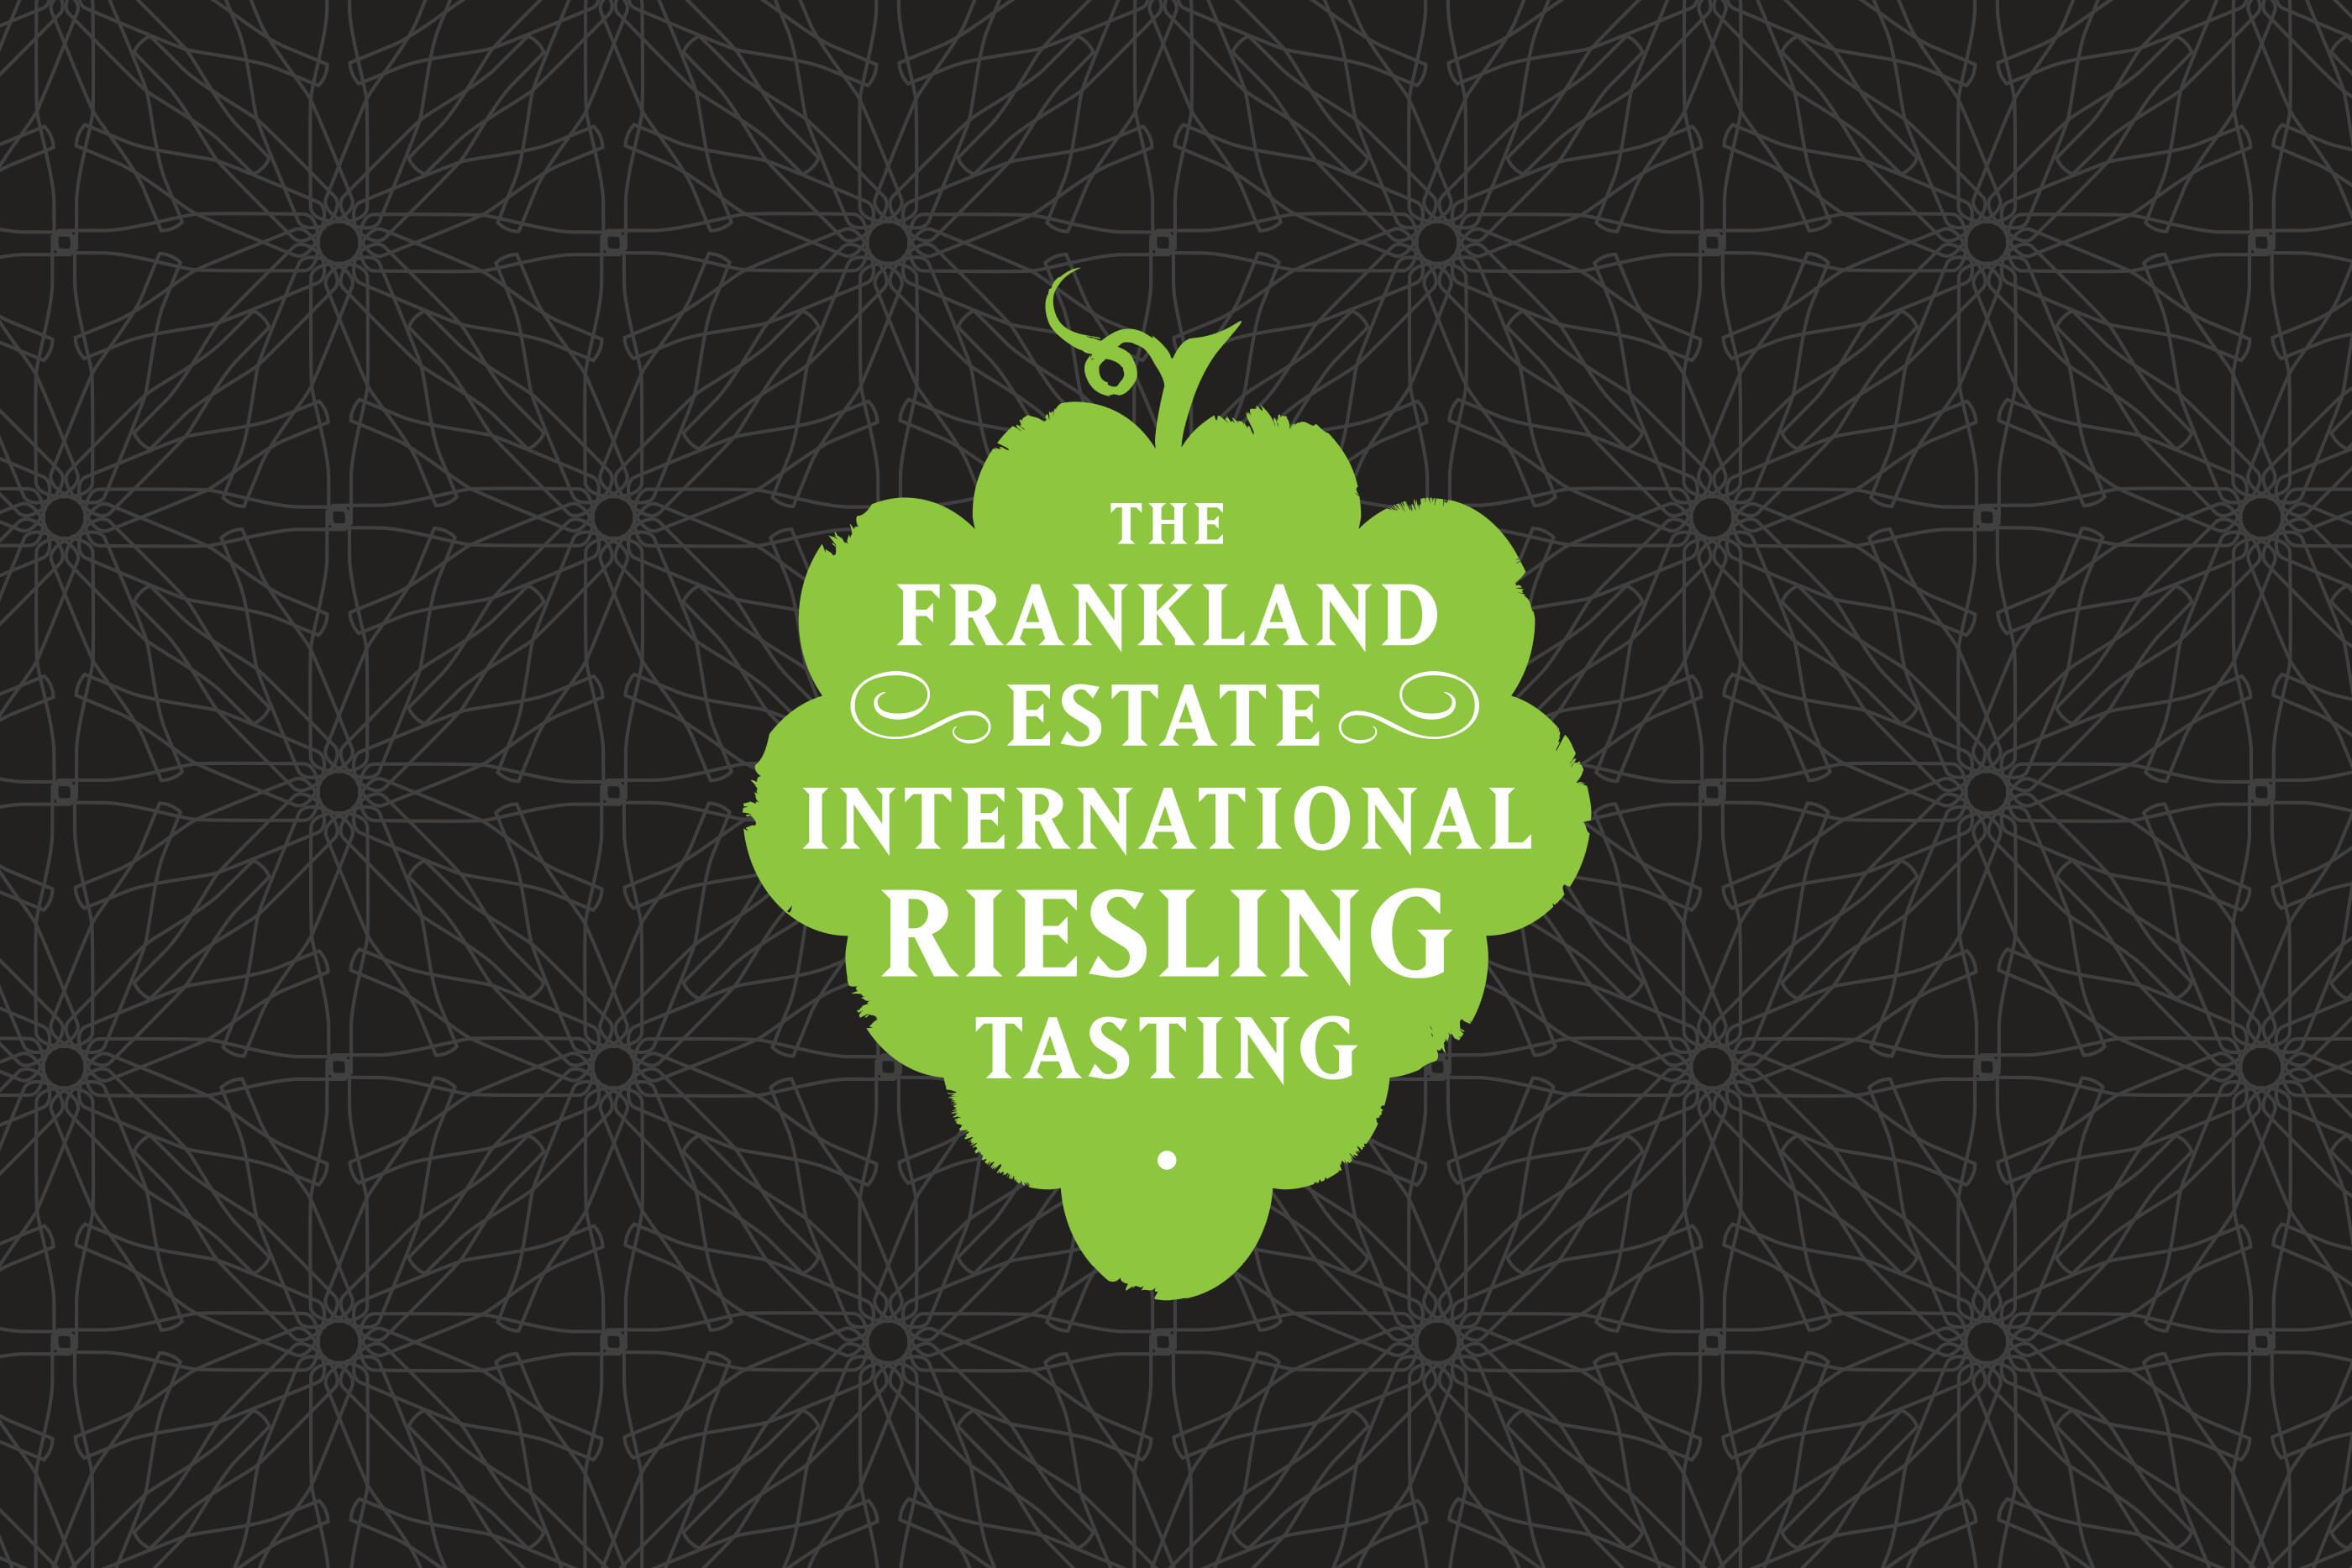 International Rielsing Tasting